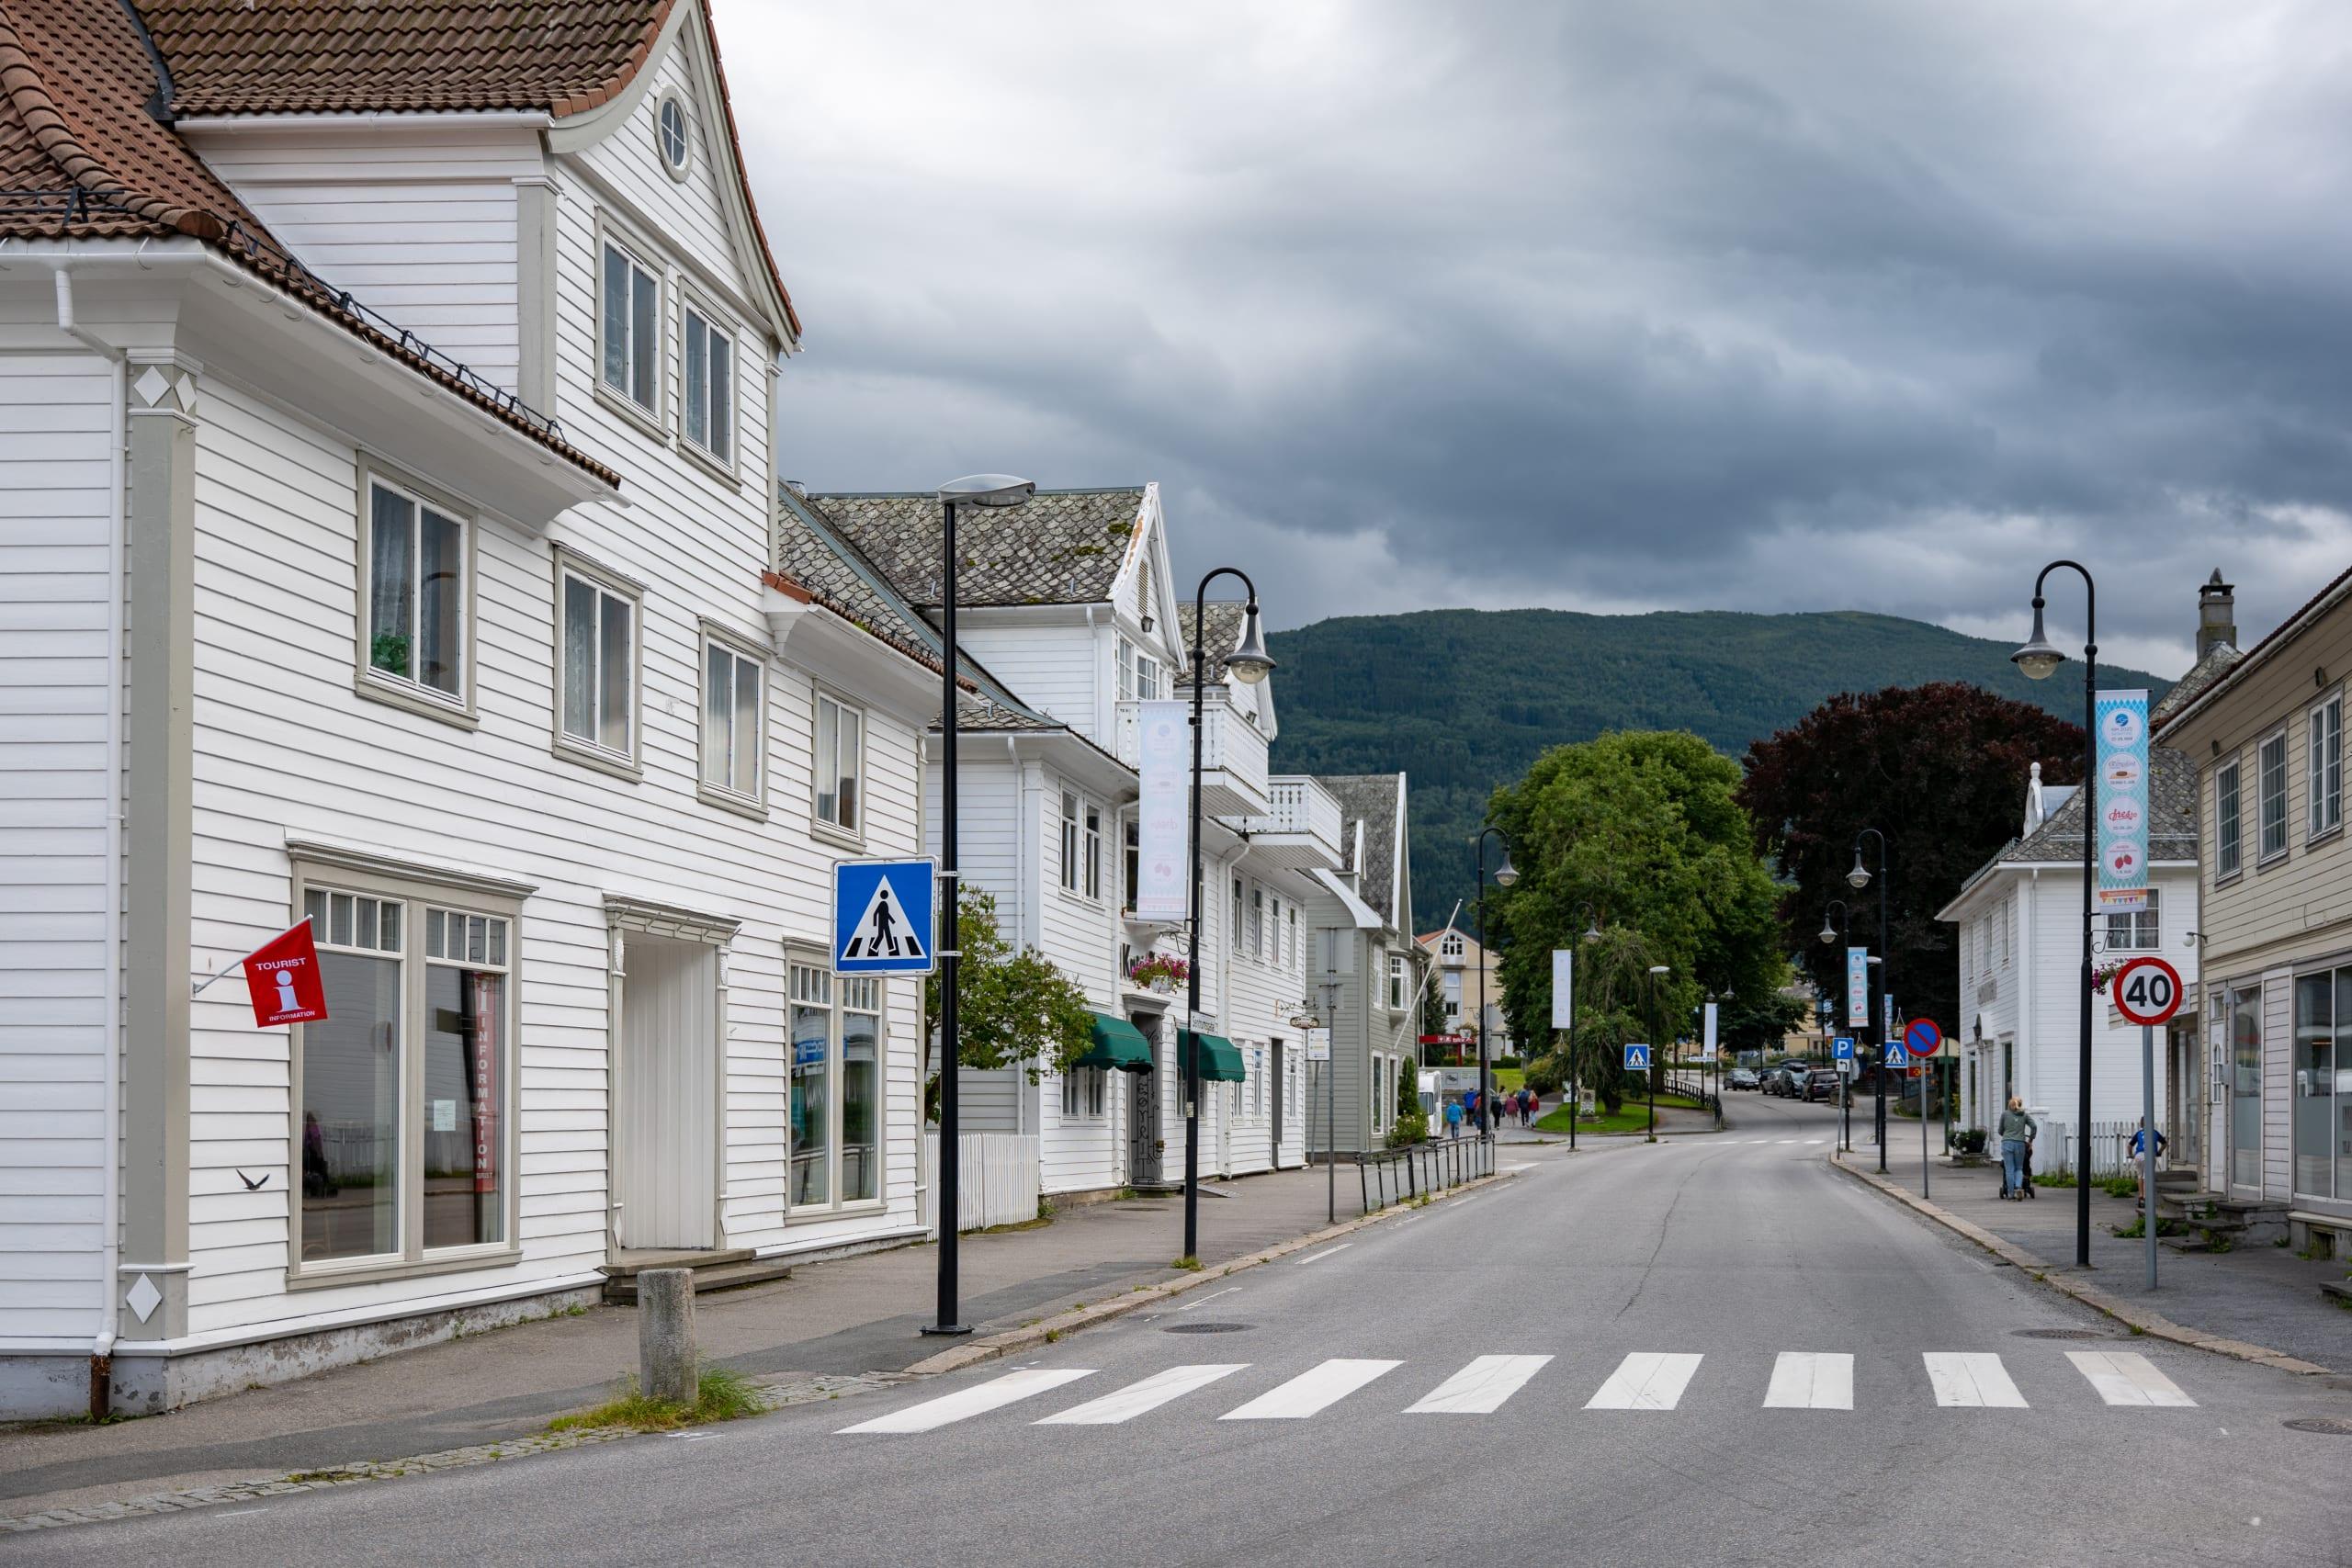 The Main Street in Vik